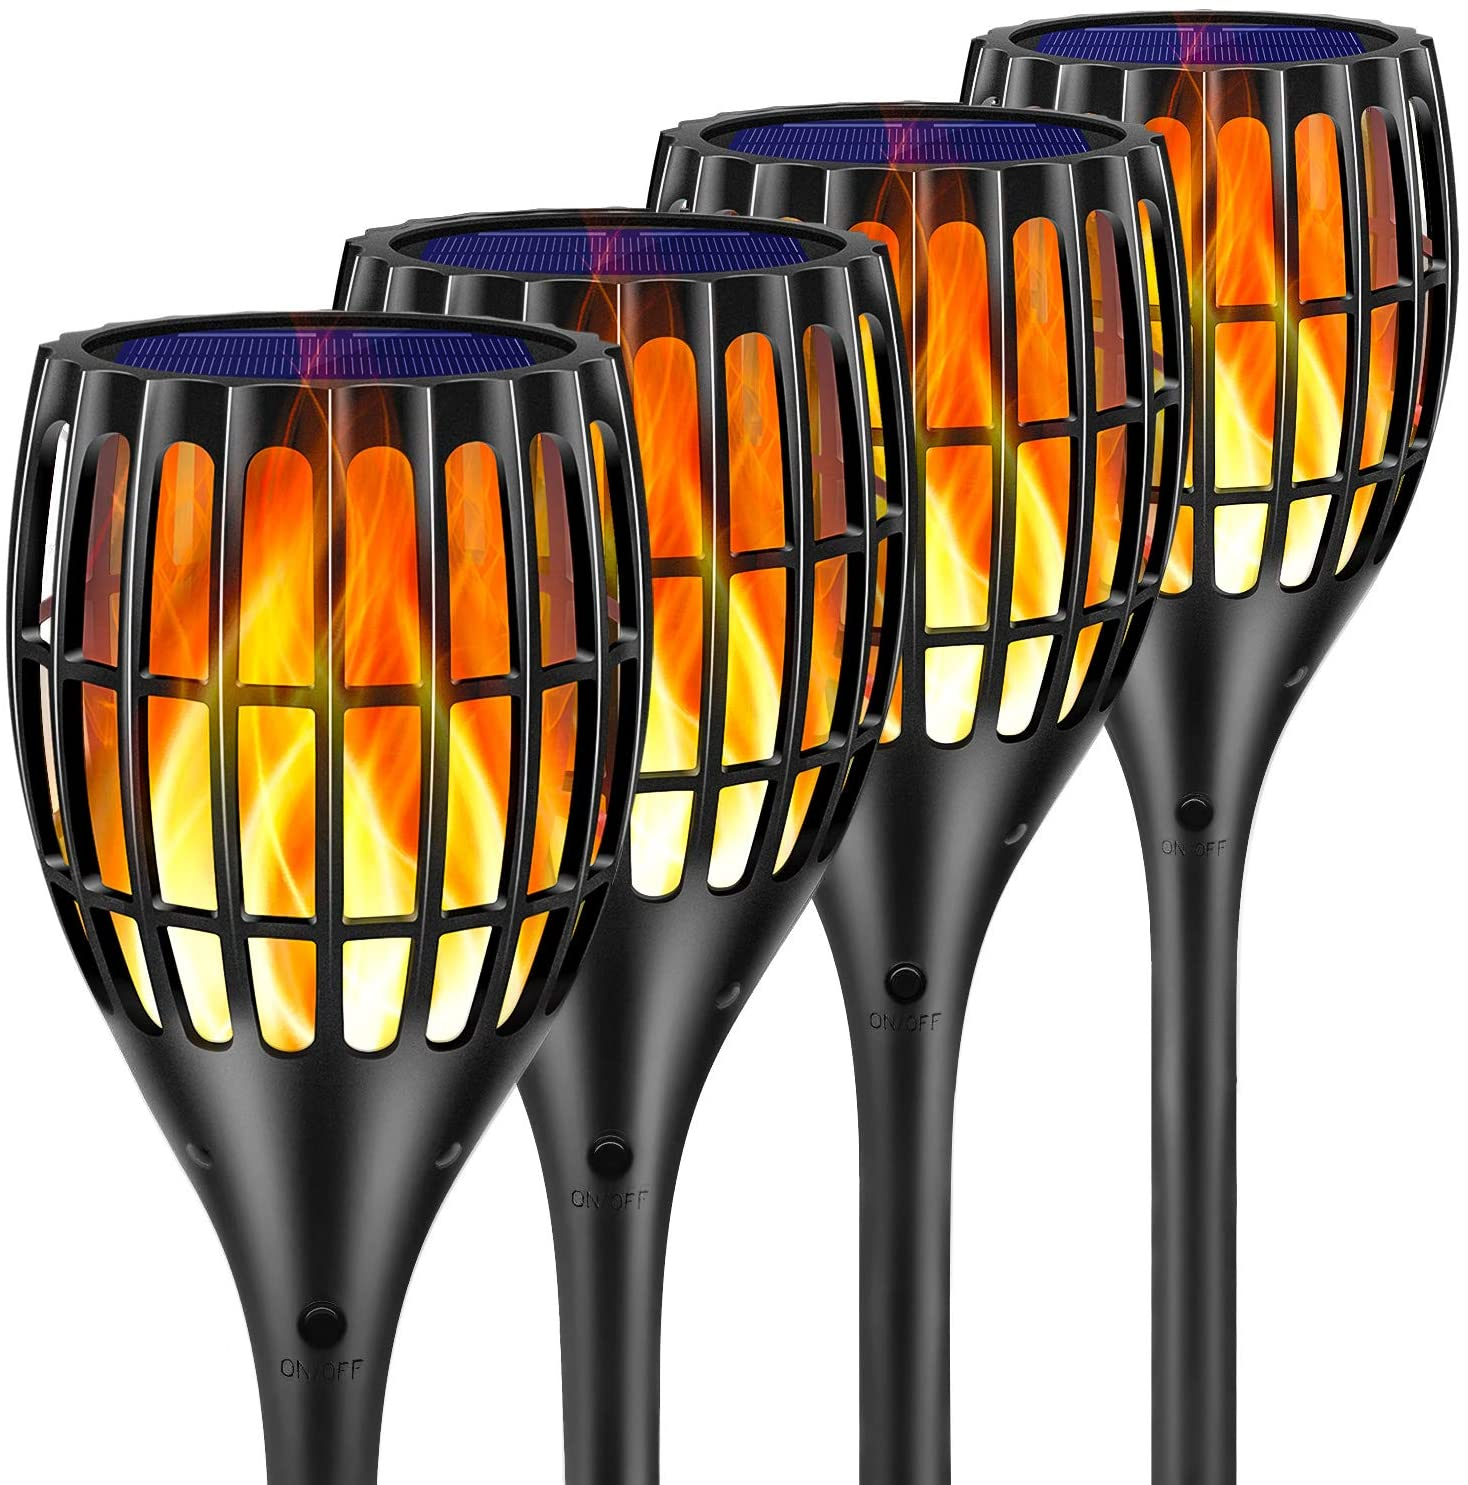 Four Ollivage torch-style solar lights, best solar lights